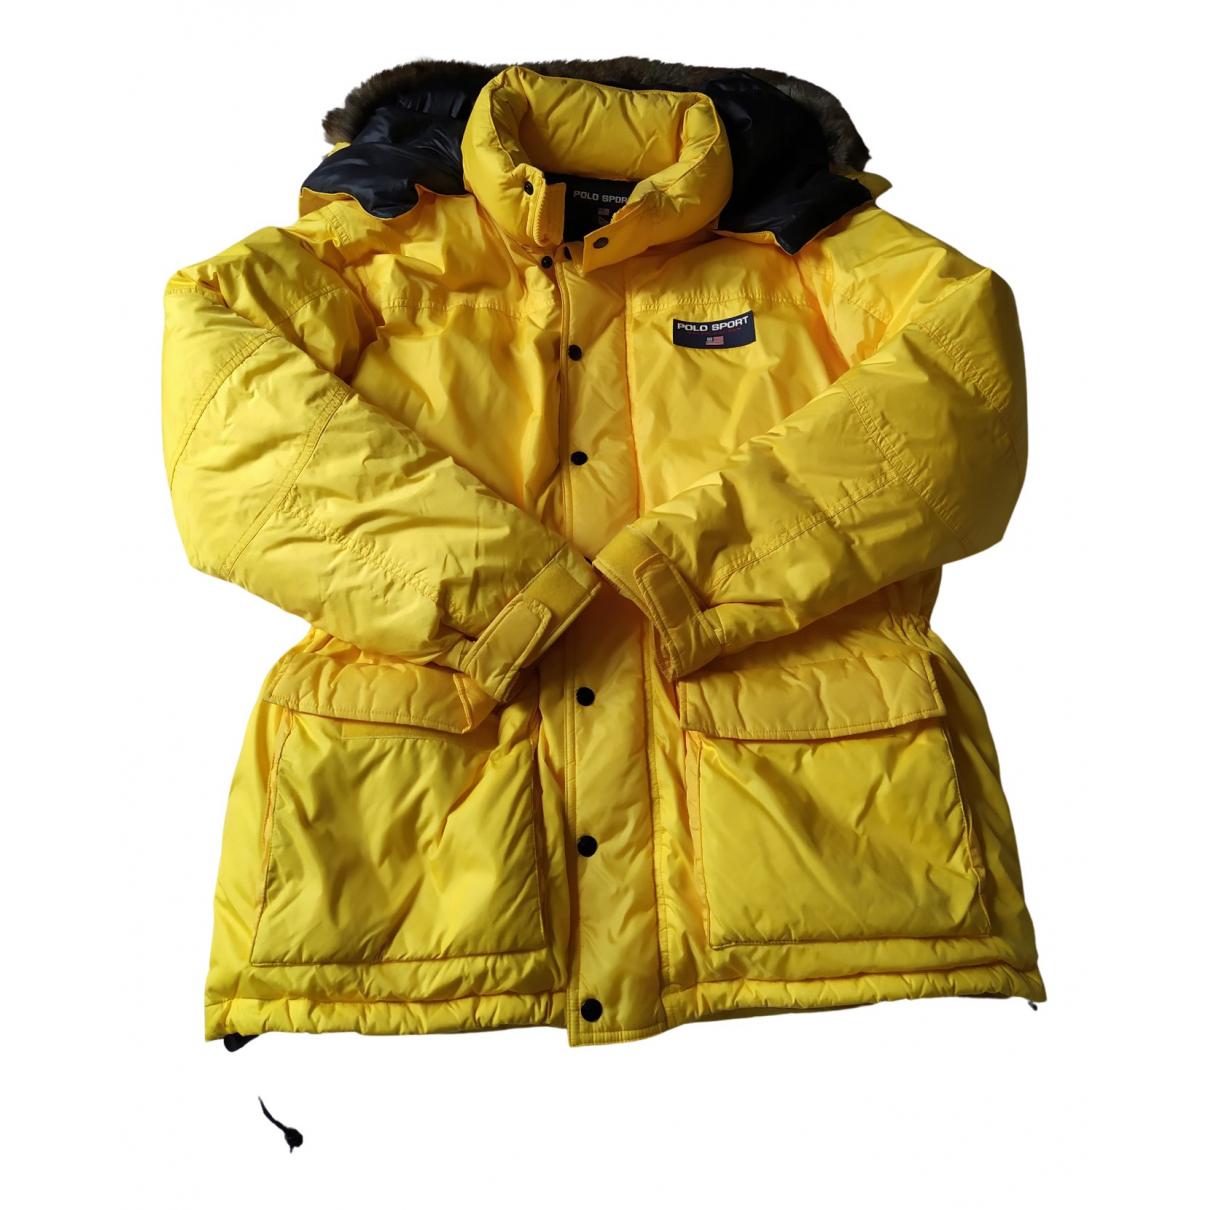 Polo Ralph Lauren \N Jacke in  Gelb Polyester